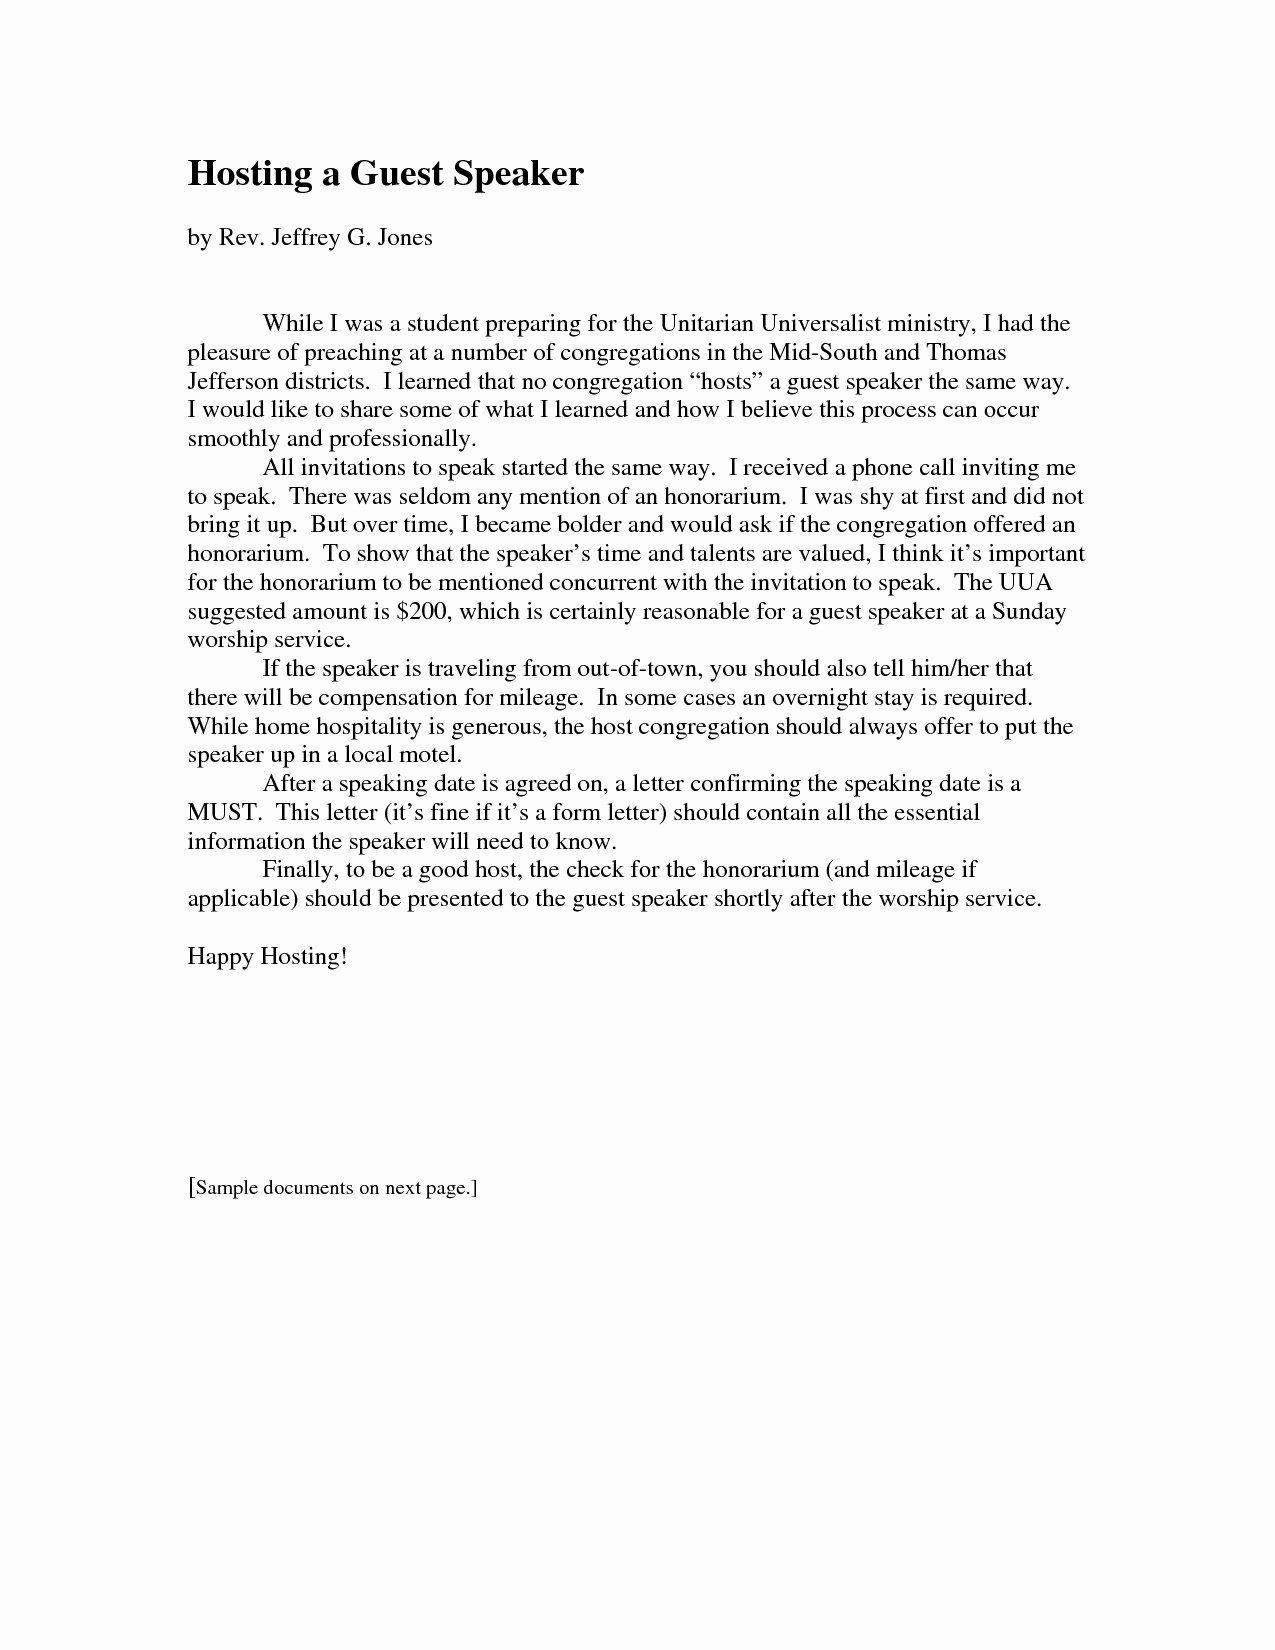 Letter Of Graduation Inspirational Sample Graduation Thank